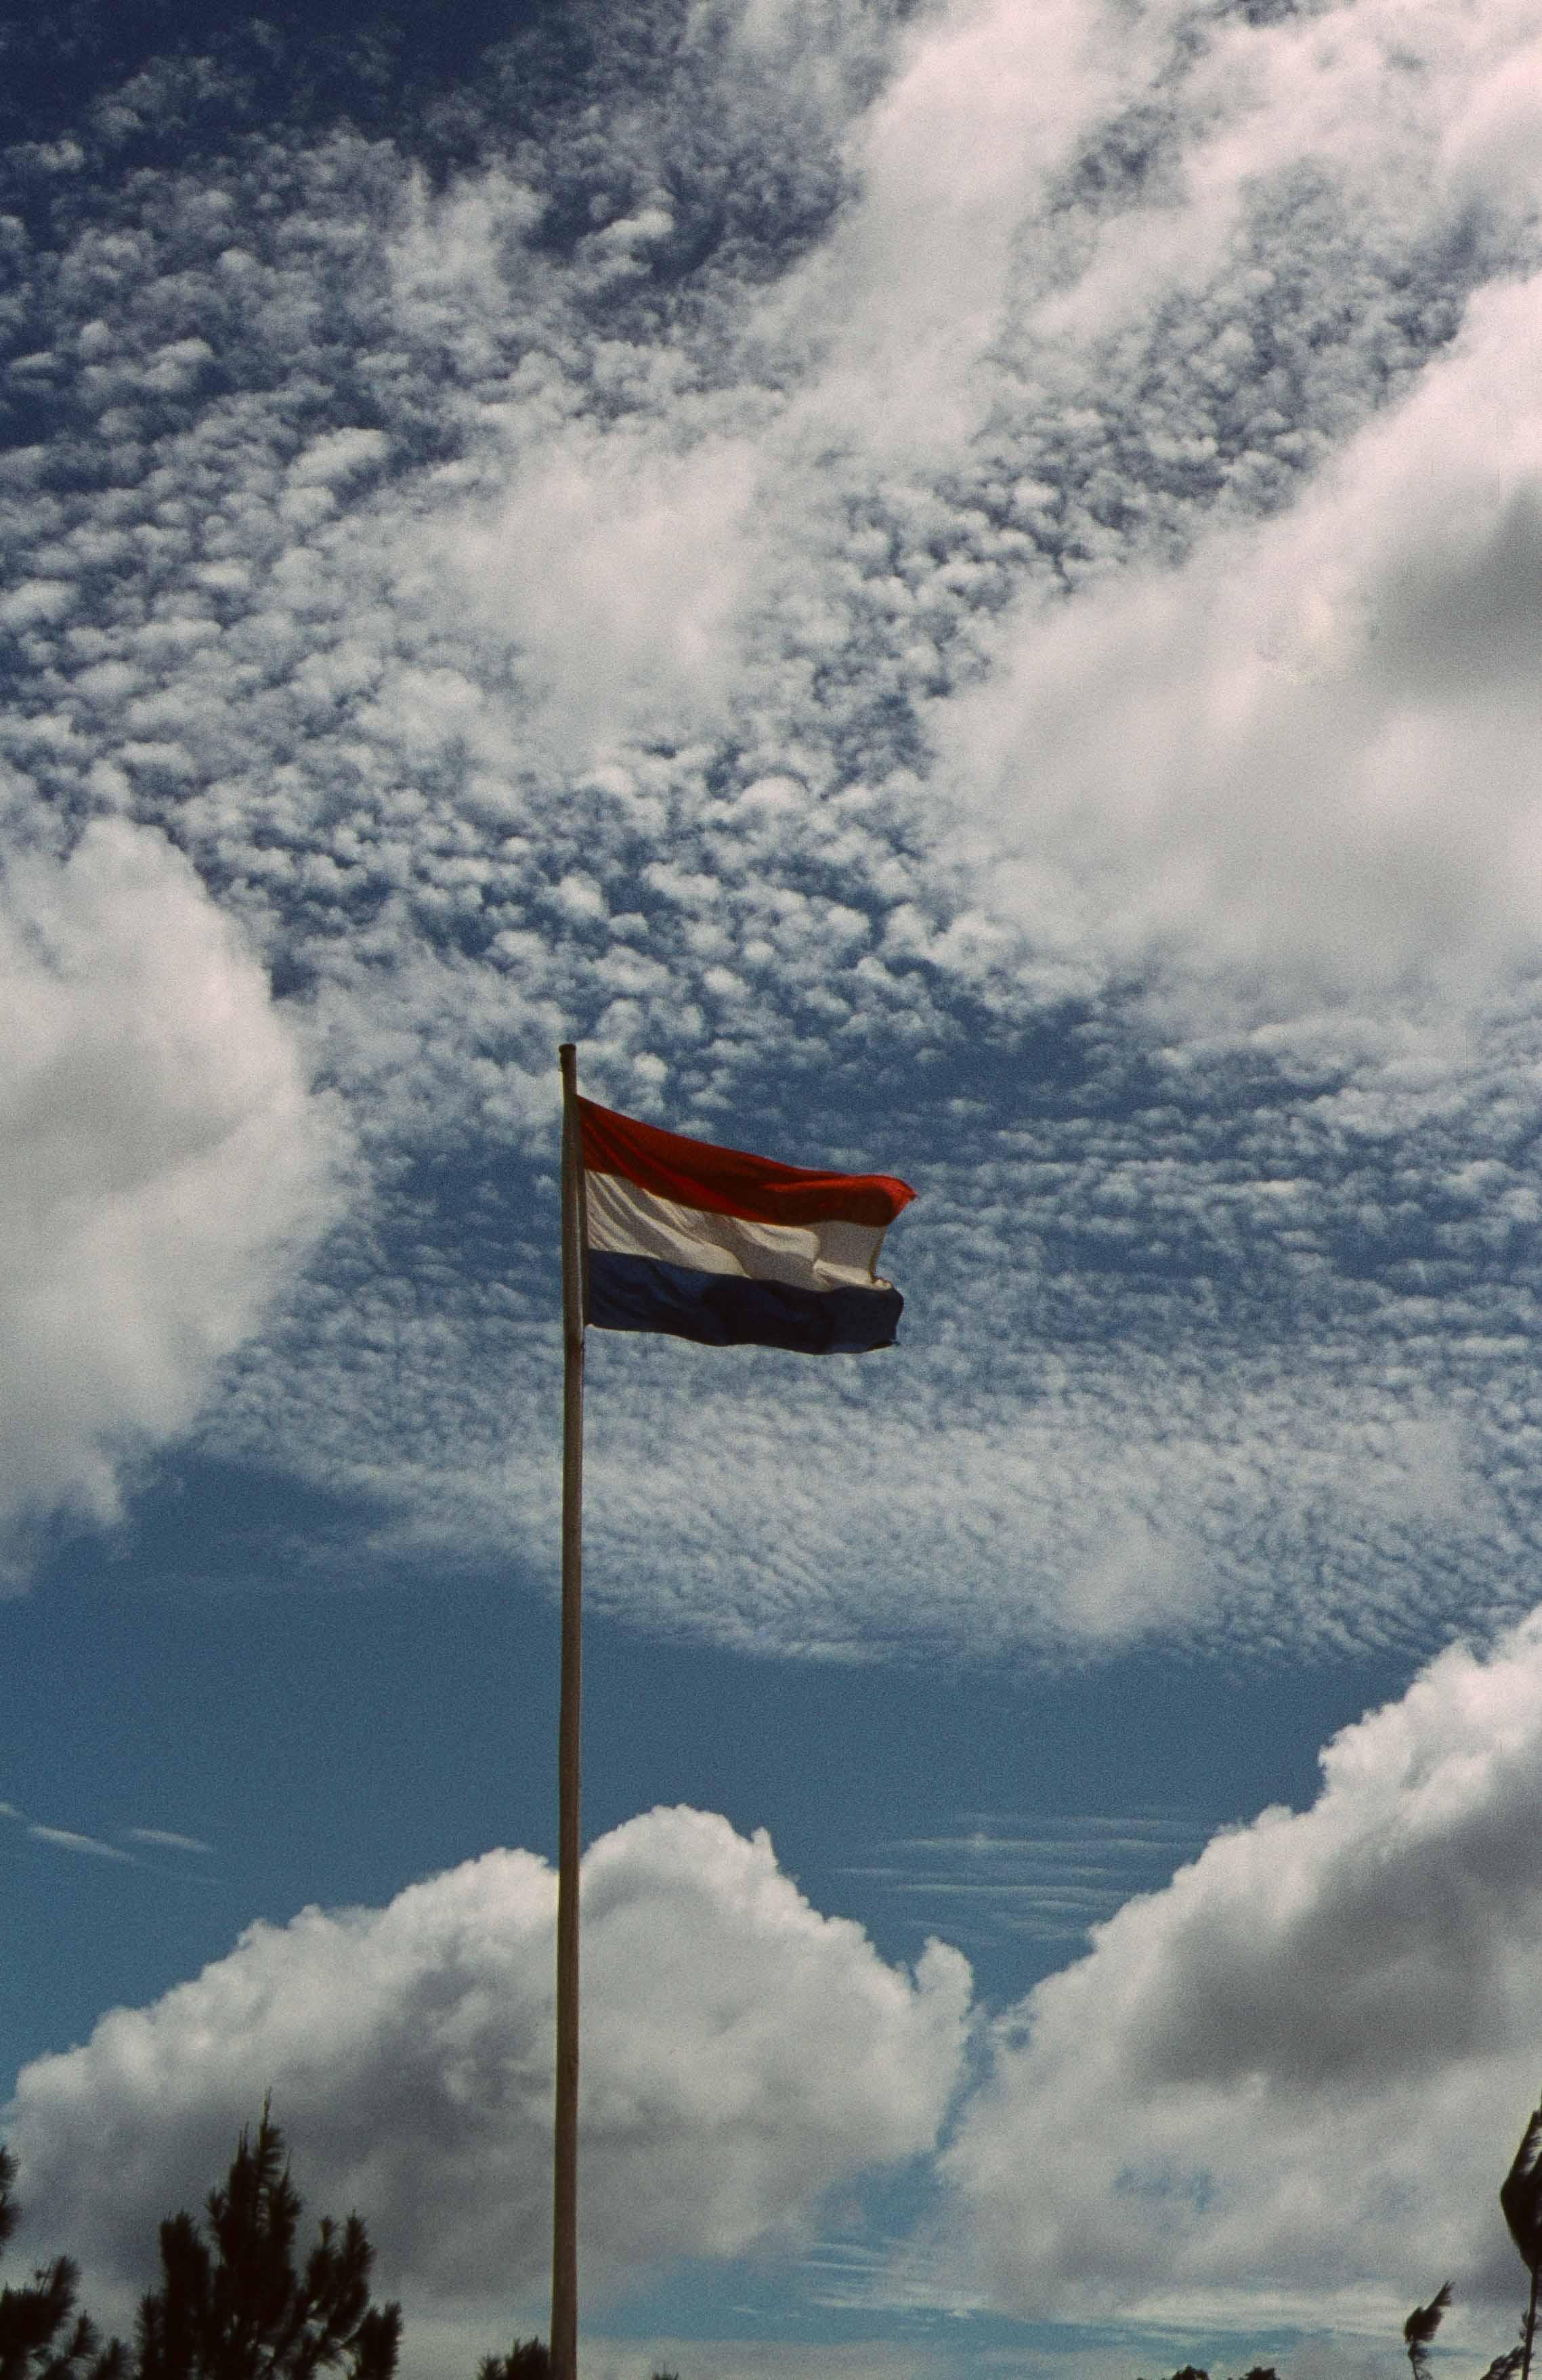 503. Suriname